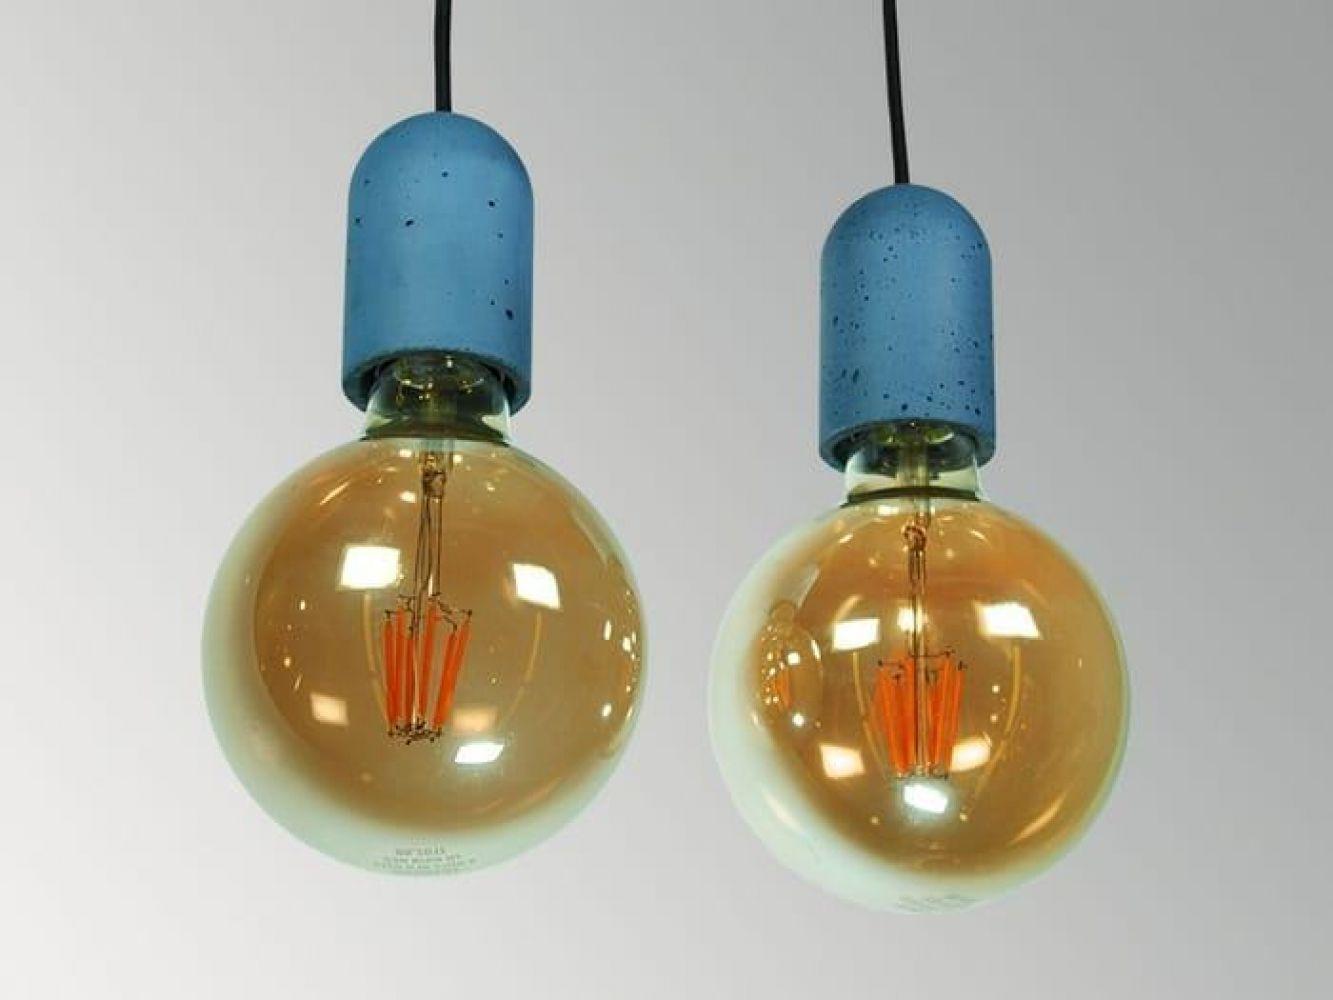 Ecolight Deco 001326